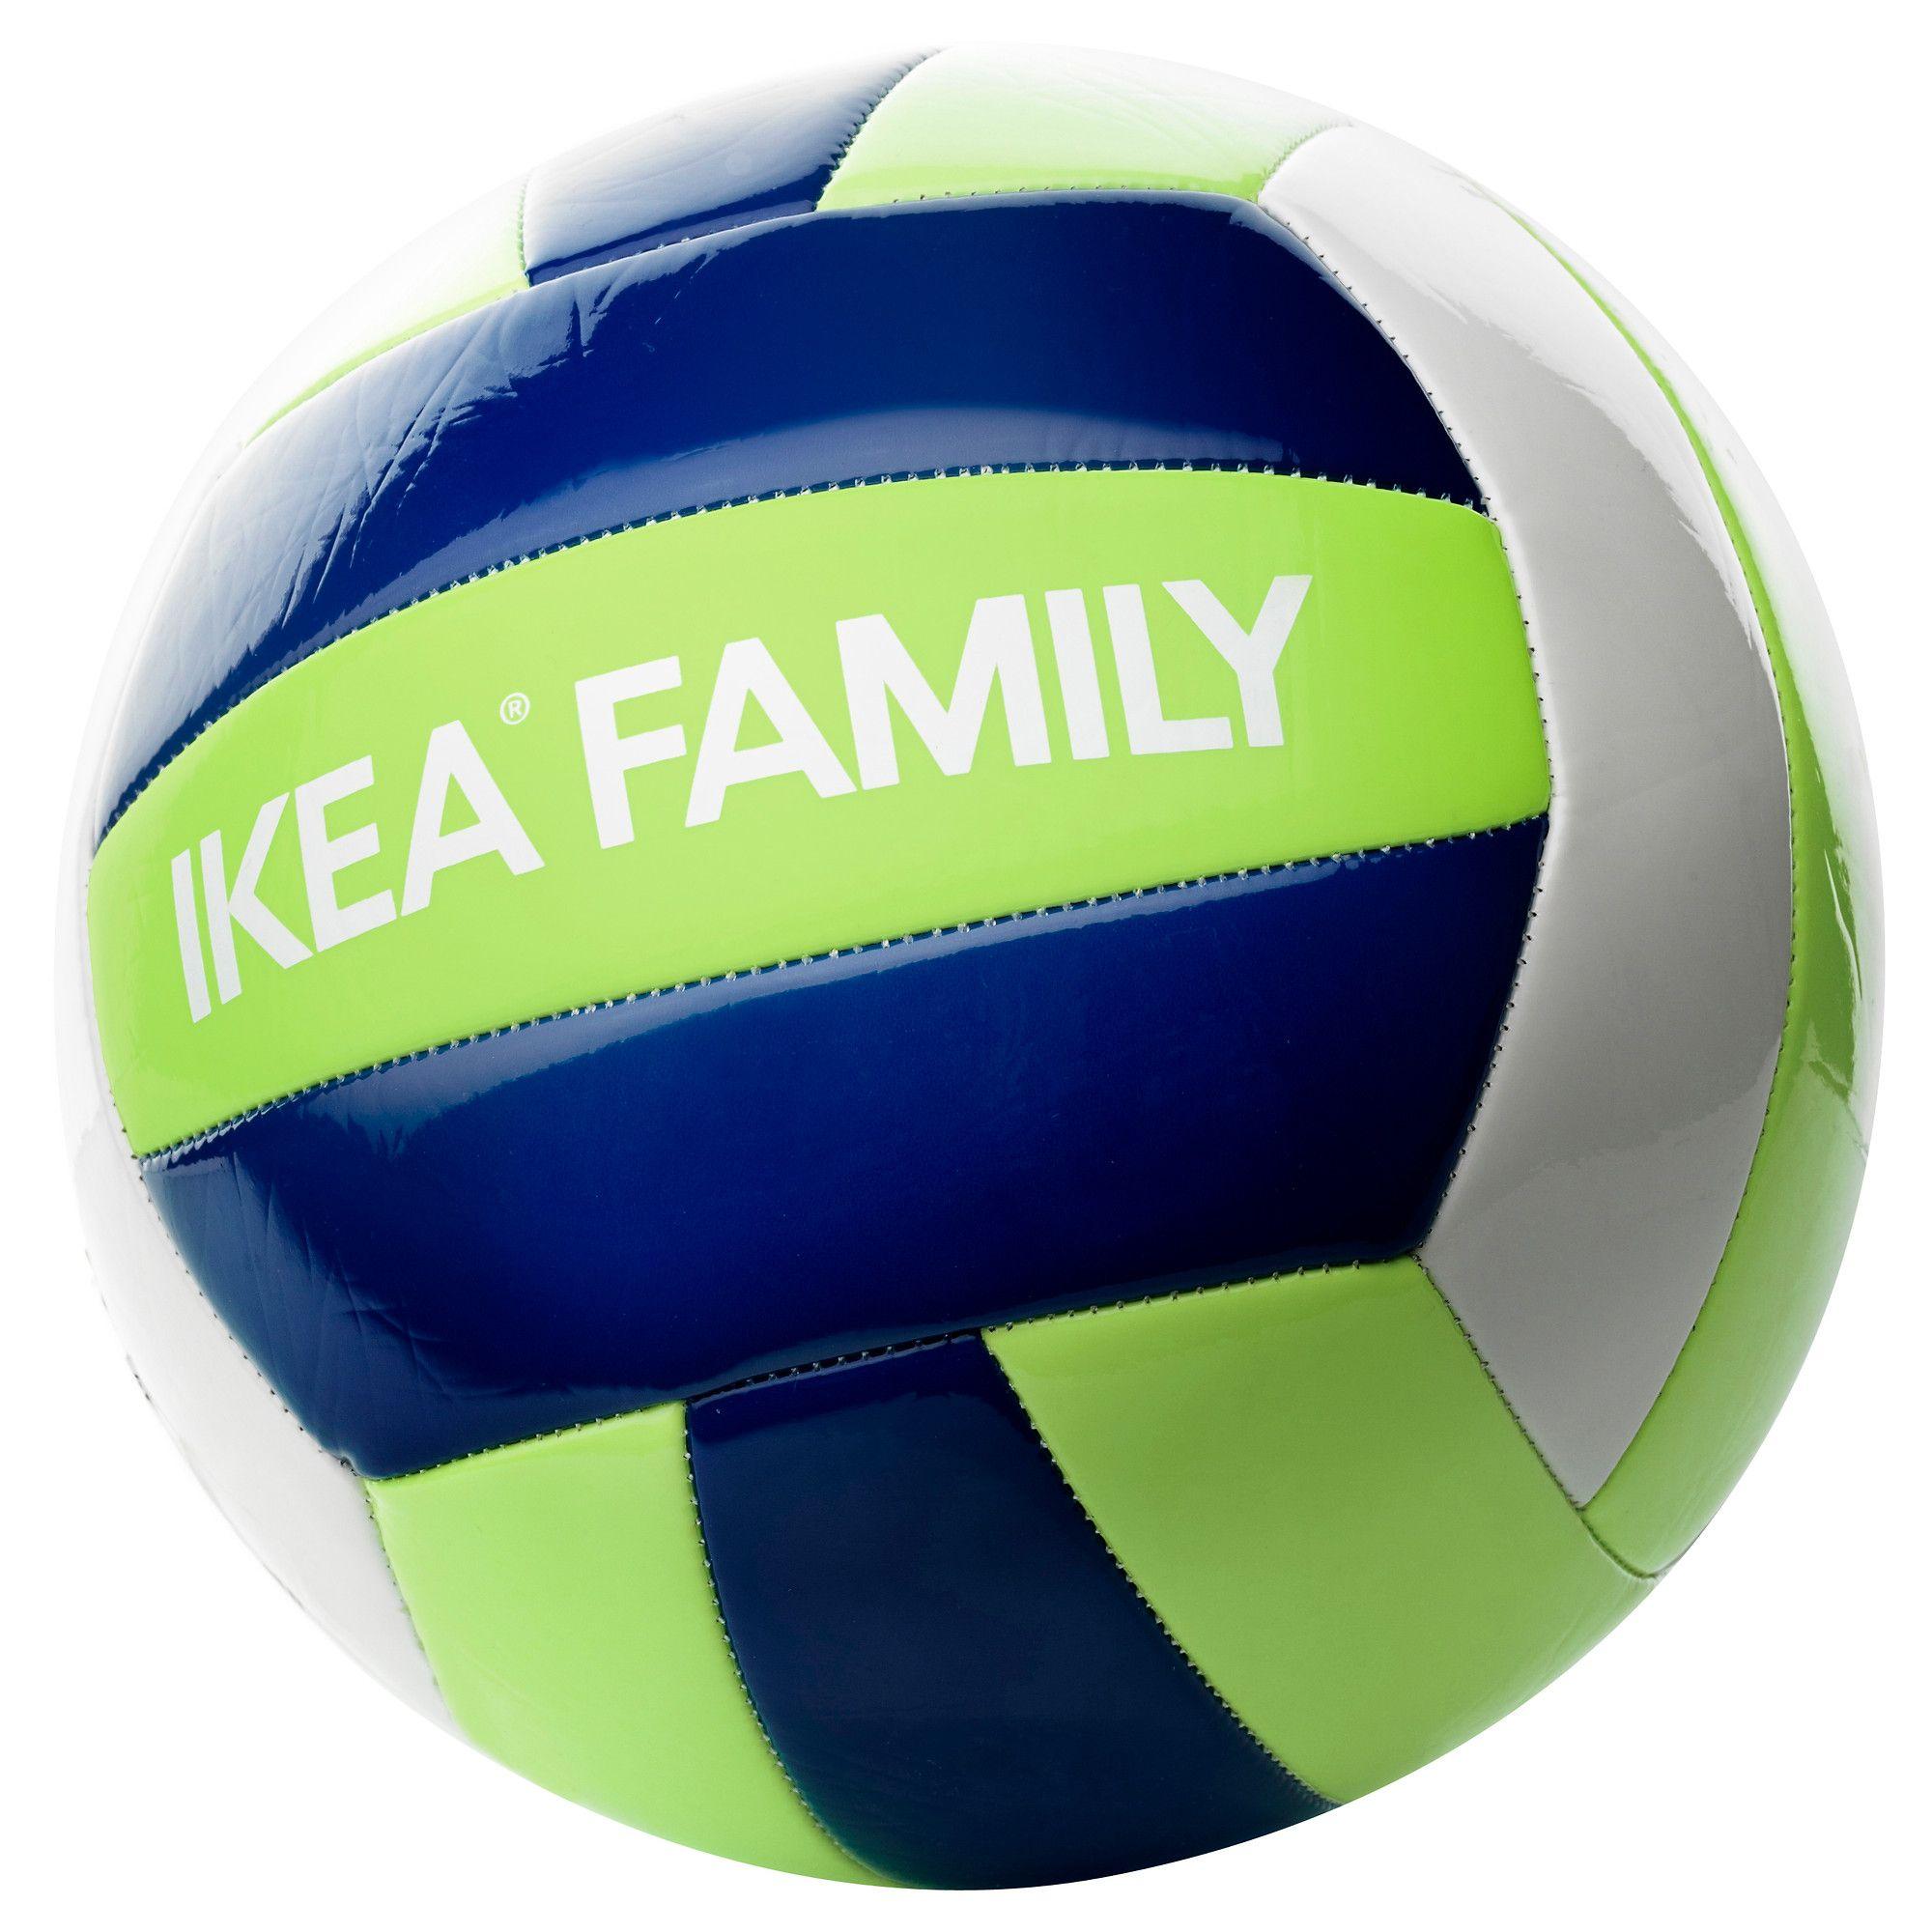 Ikea Us Furniture And Home Furnishings Ikea Ikea Family Ikea New